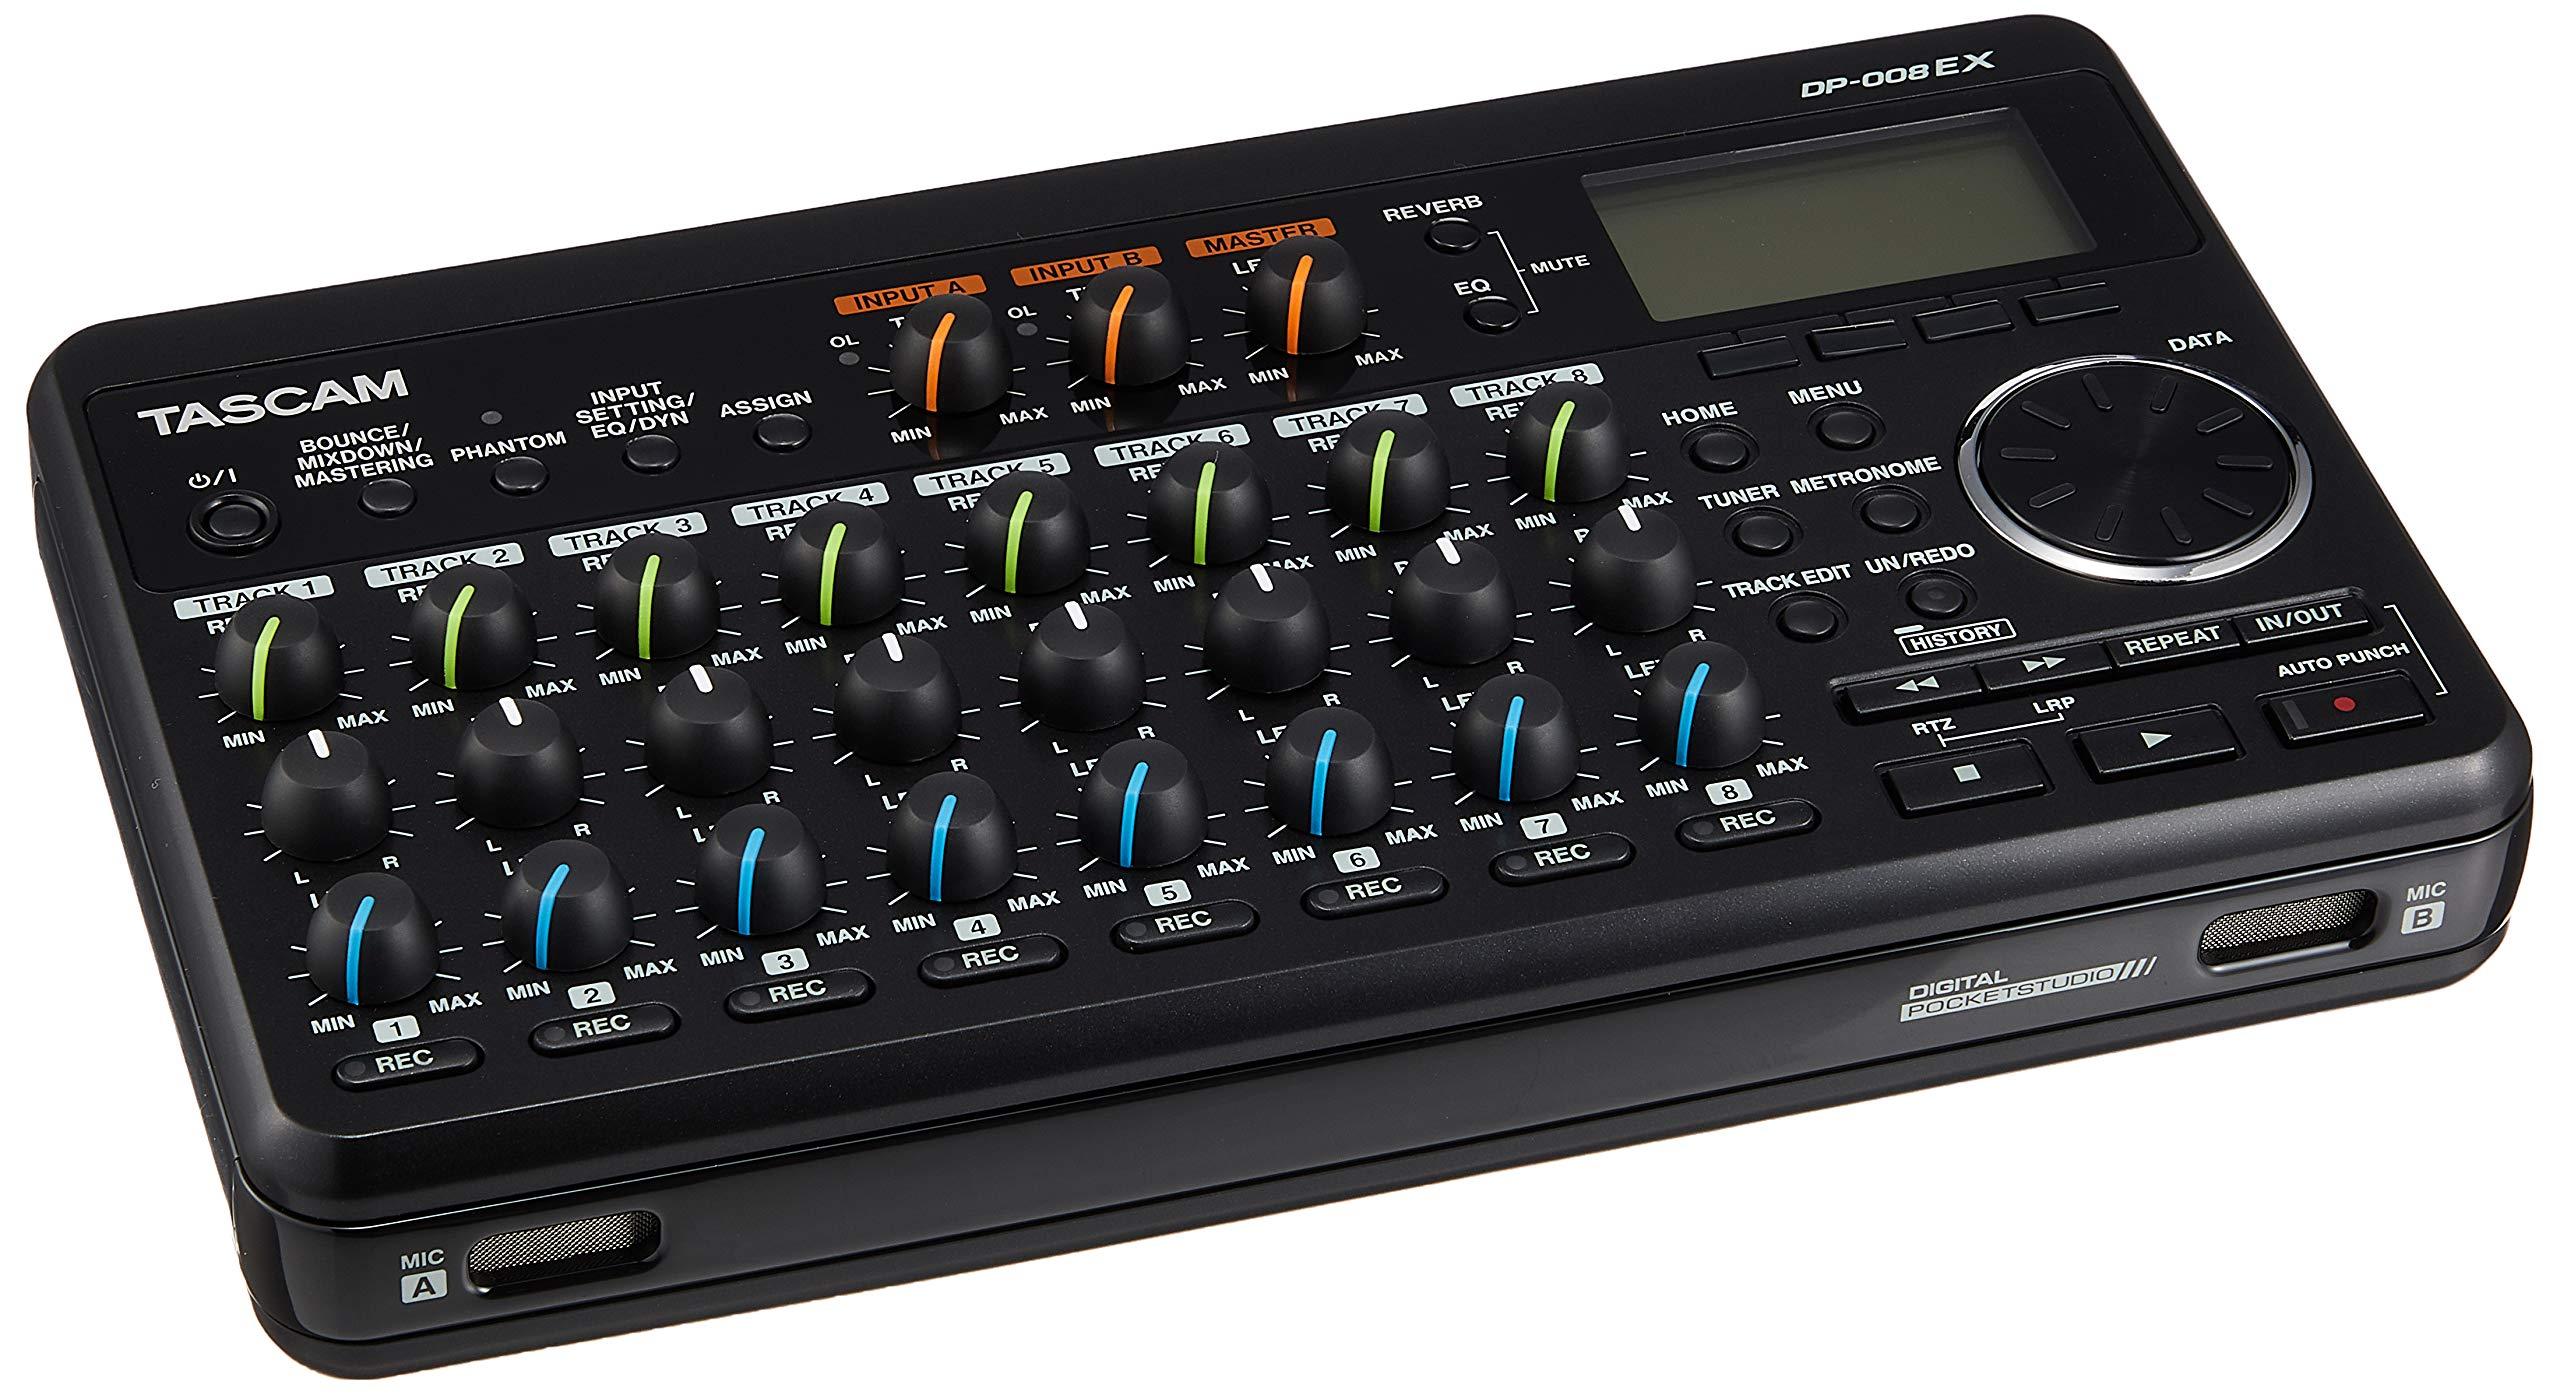 Tascam DP-008EX 8-Track Digital Multitrack Recorder - Bundle with 2X Tascam VL-S5 5'' 2-Way Professional Studio Monitor